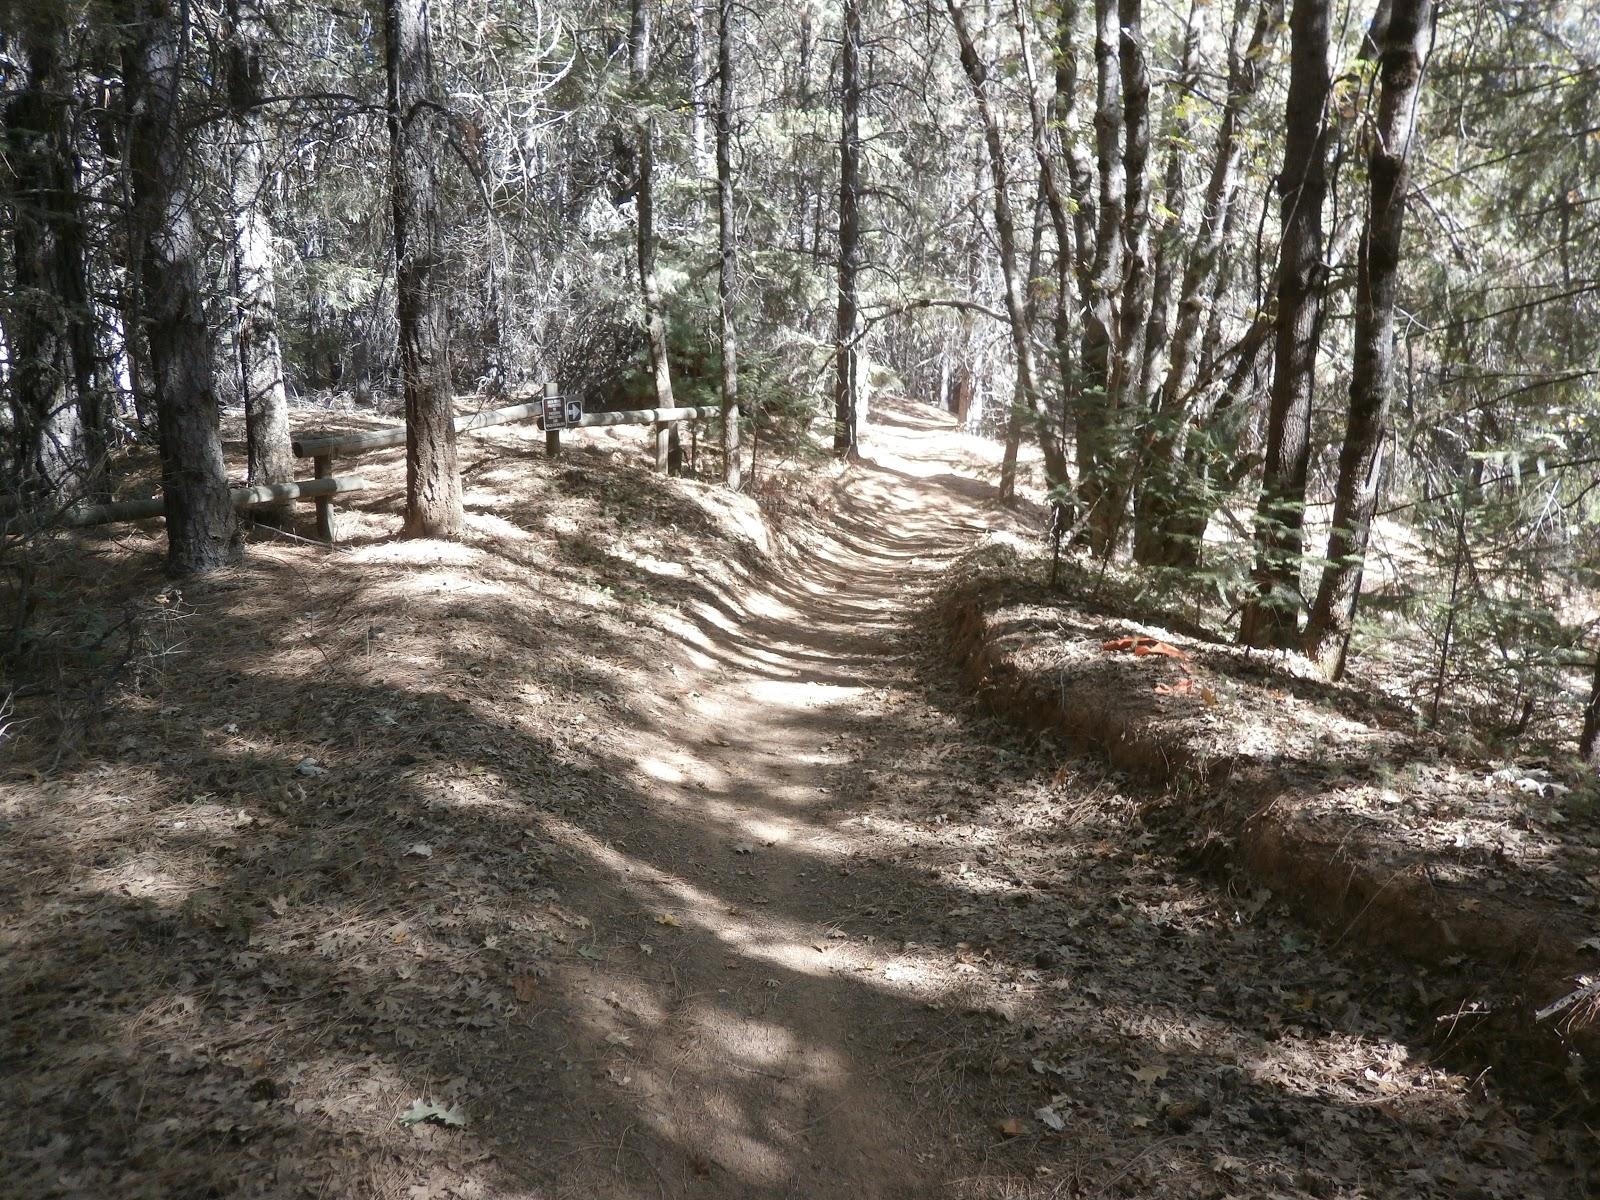 Roland Sturm Mountain Biking Across Northern California